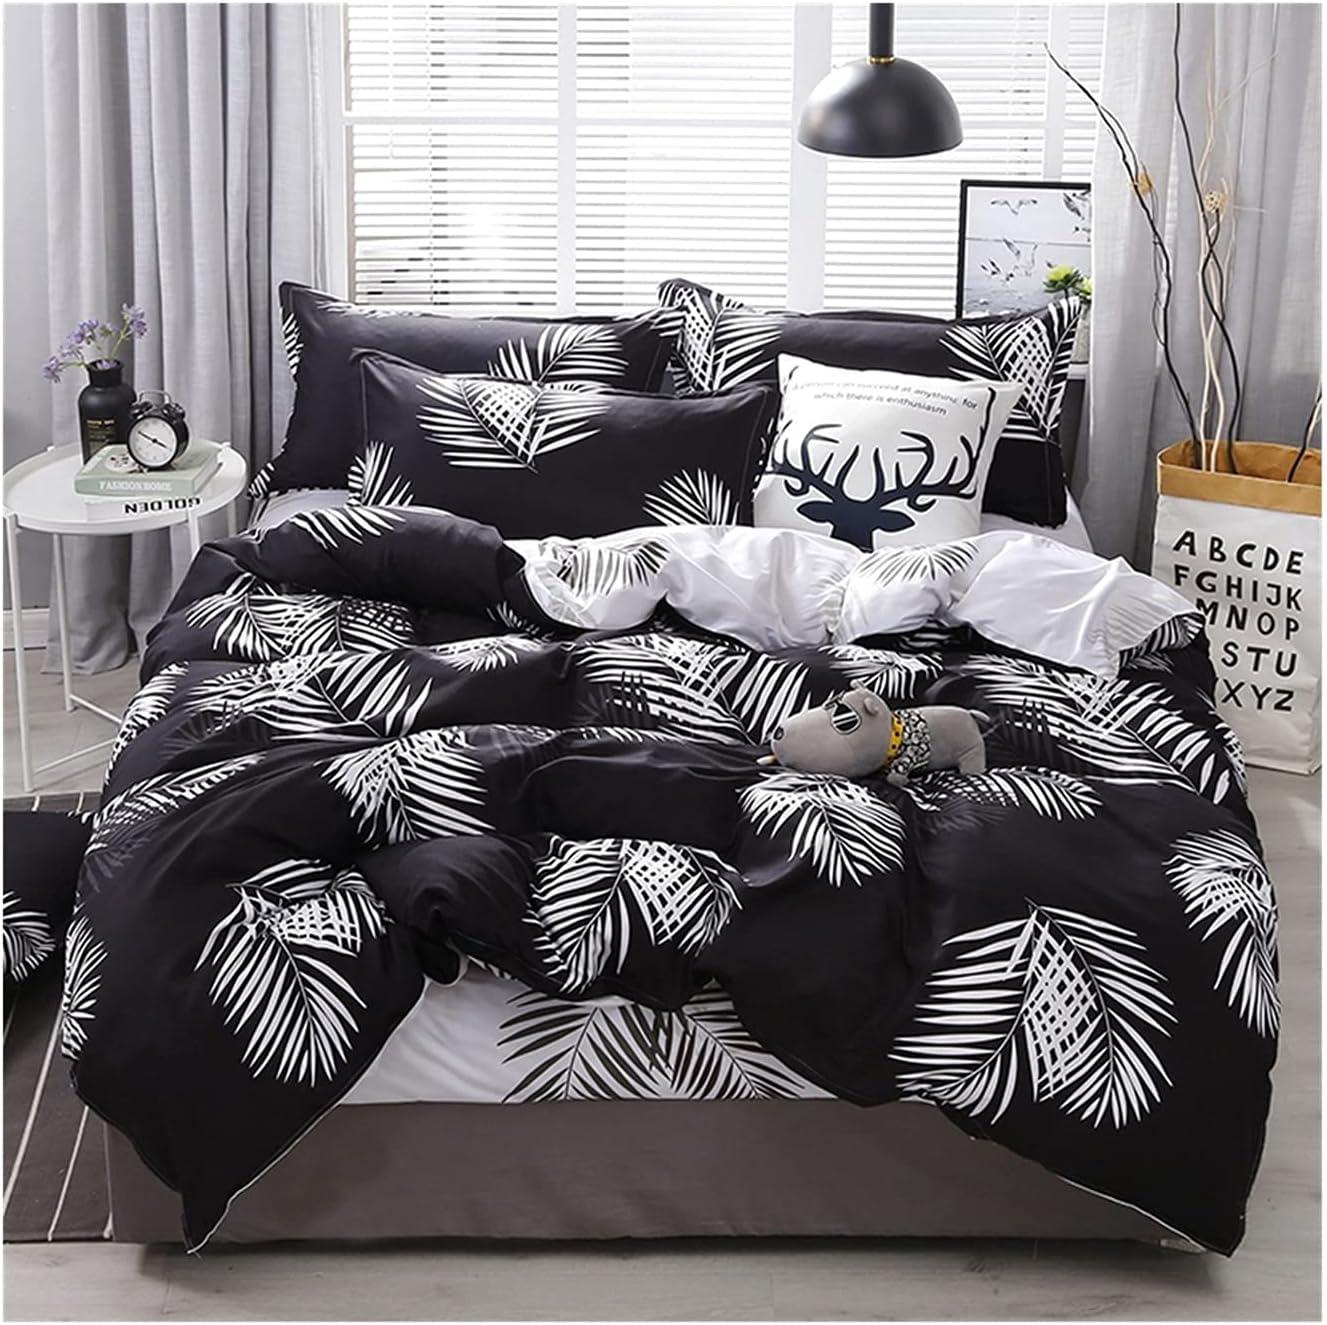 LSDJ Overseas parallel import regular item QMDSH Home Textile Girl Bedding Set Cover Peach Duvet Pink Sale SALE% OFF